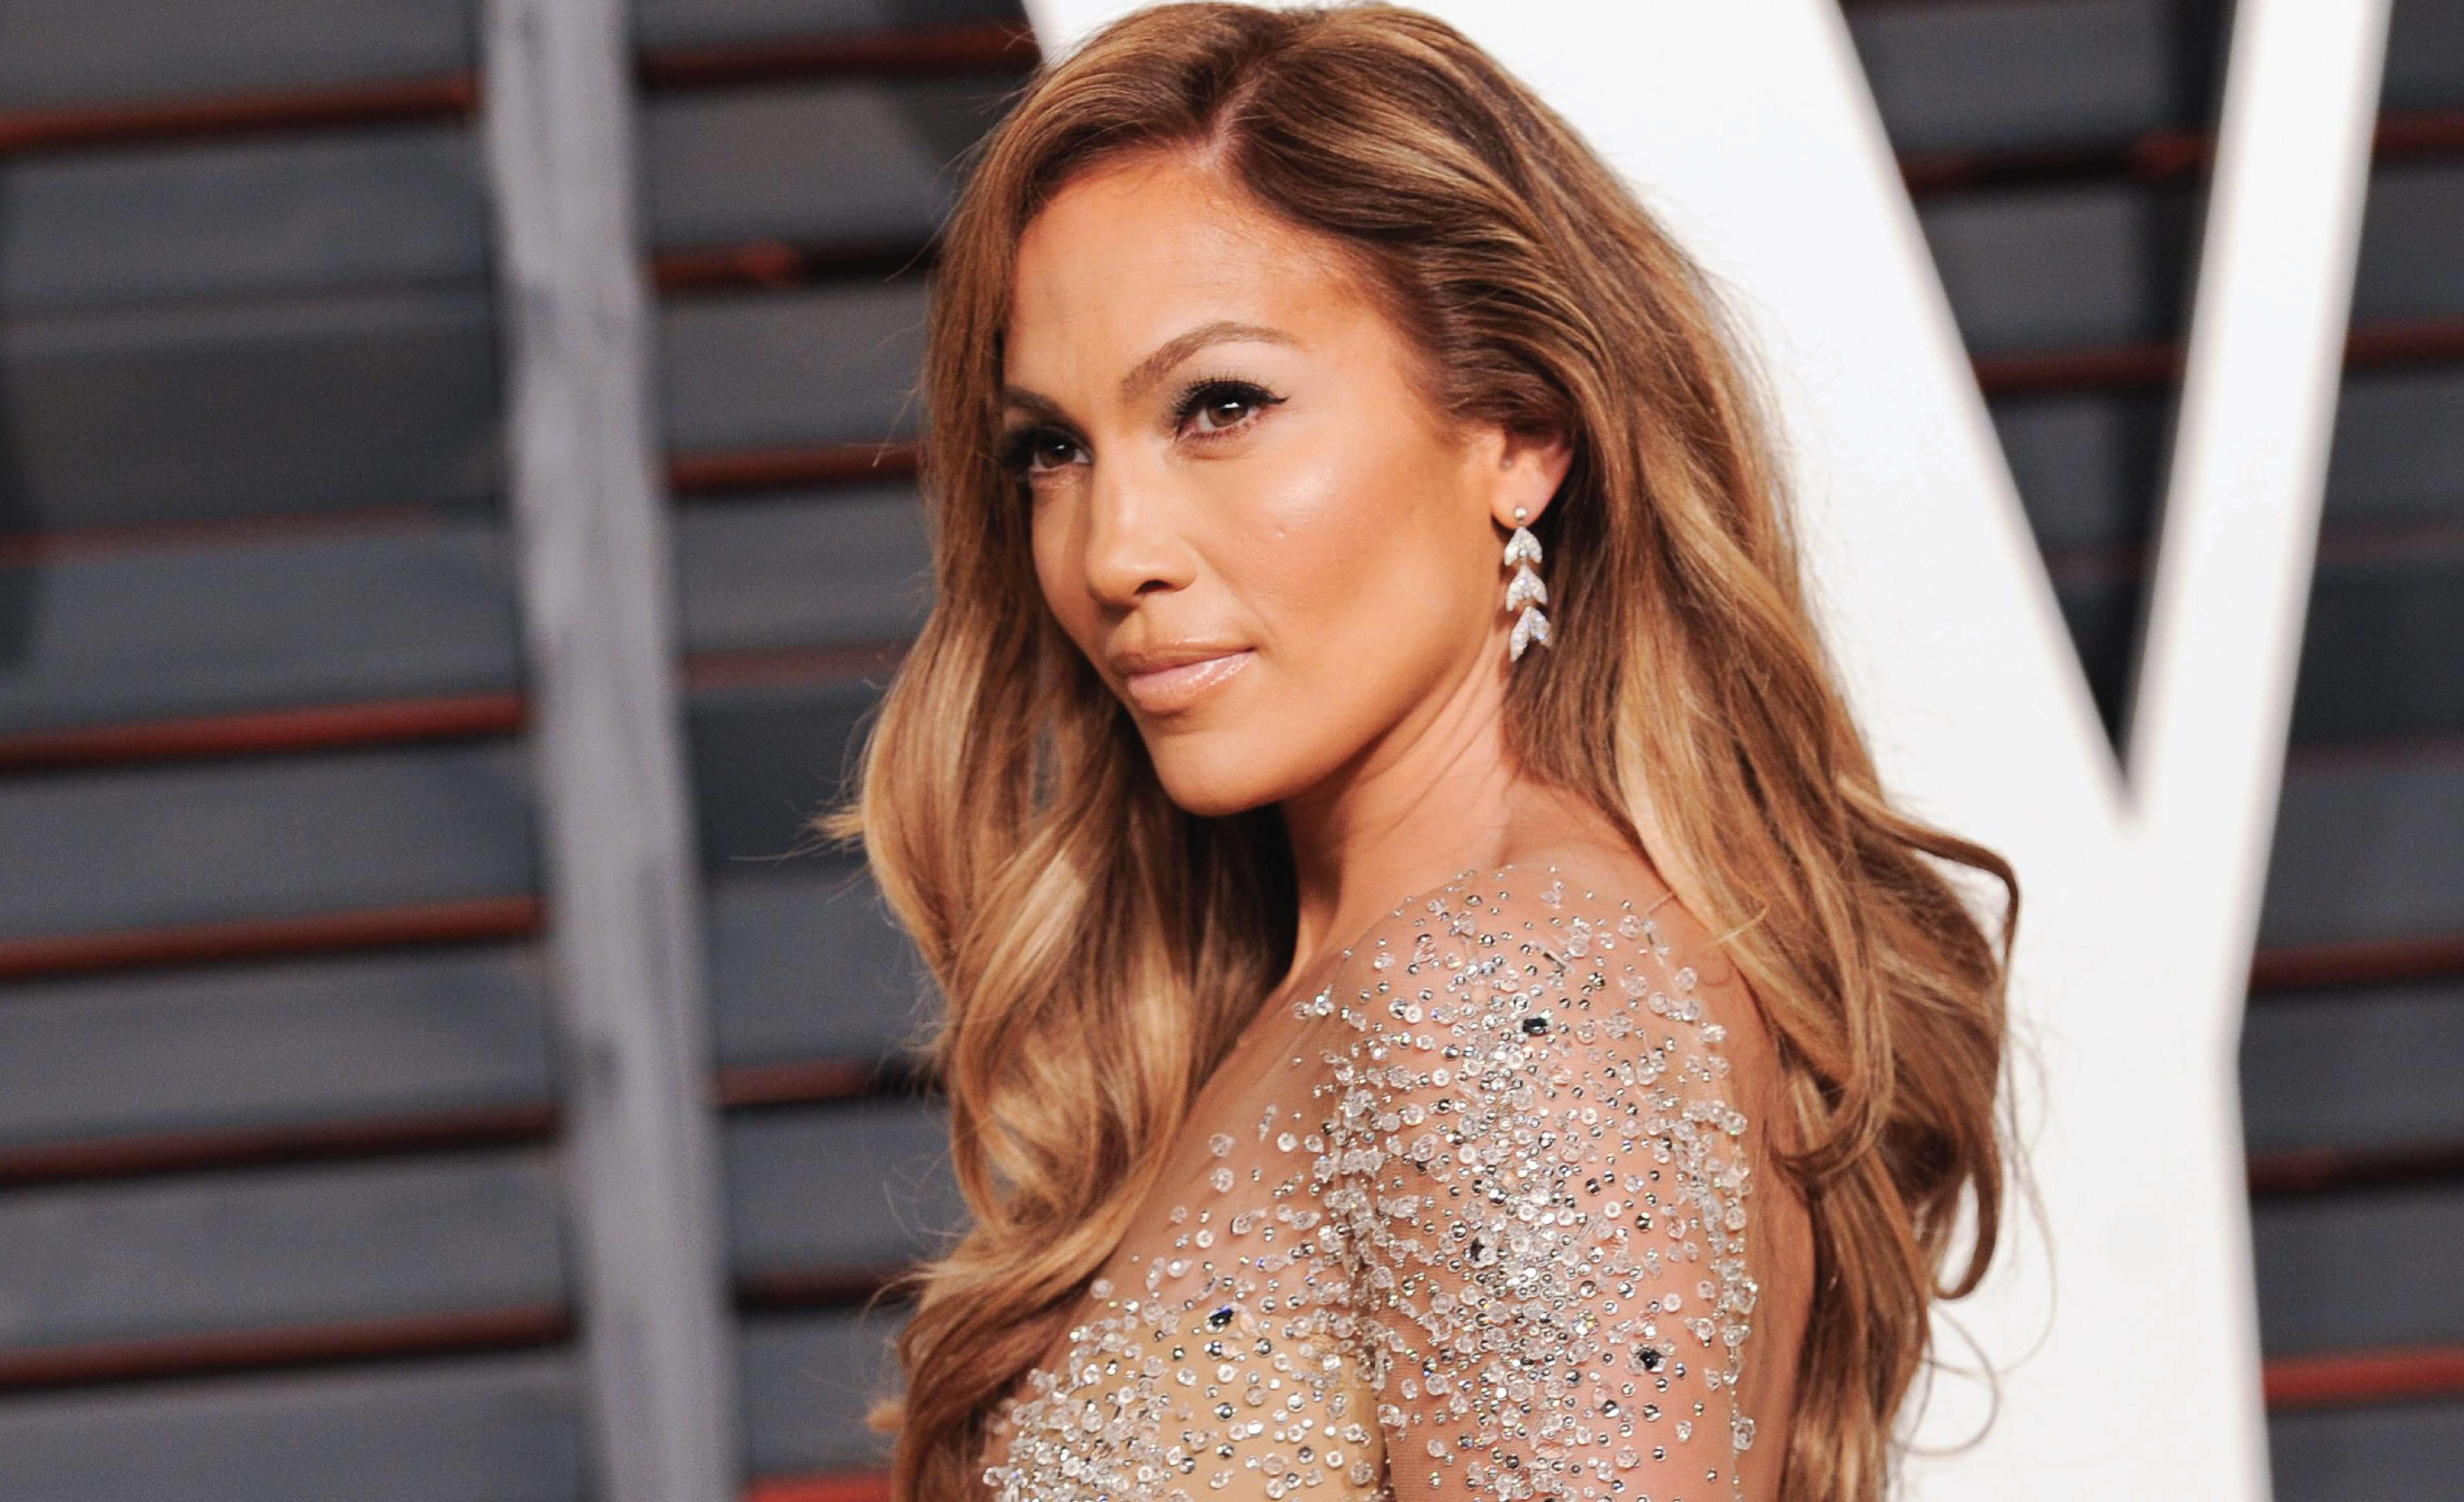 Has Jennifer Lopez had Cosmetic Surgery?